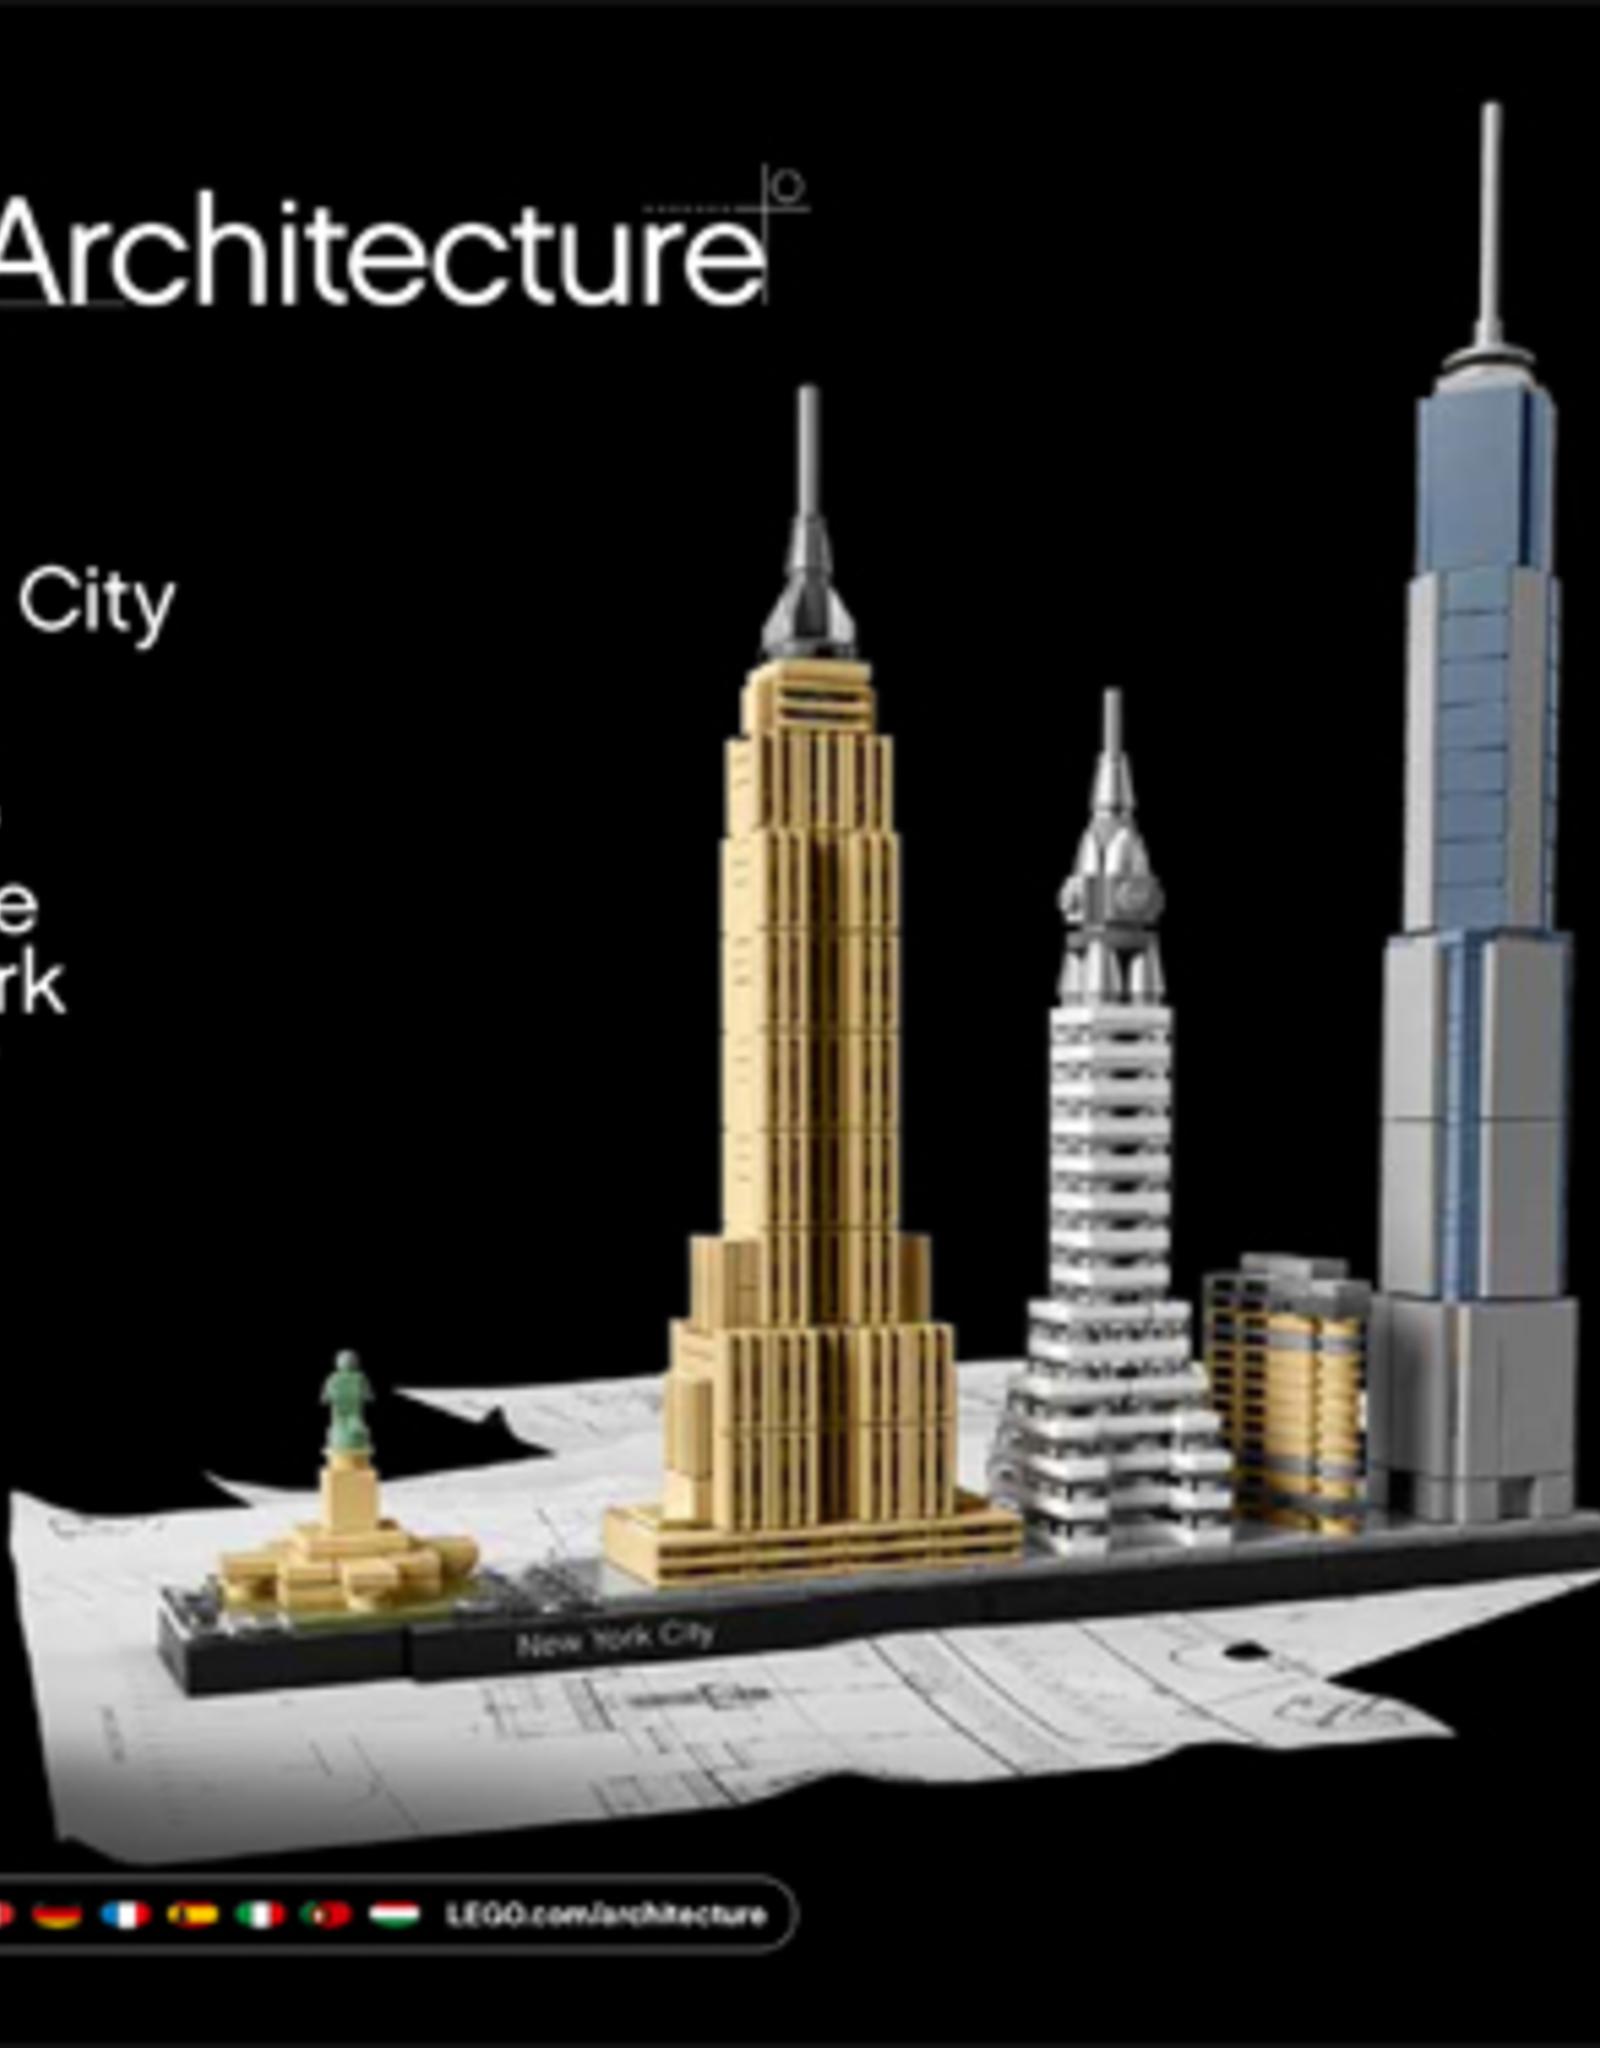 LEGO LEGO 21028 New York City - Architecture - SPECIALS